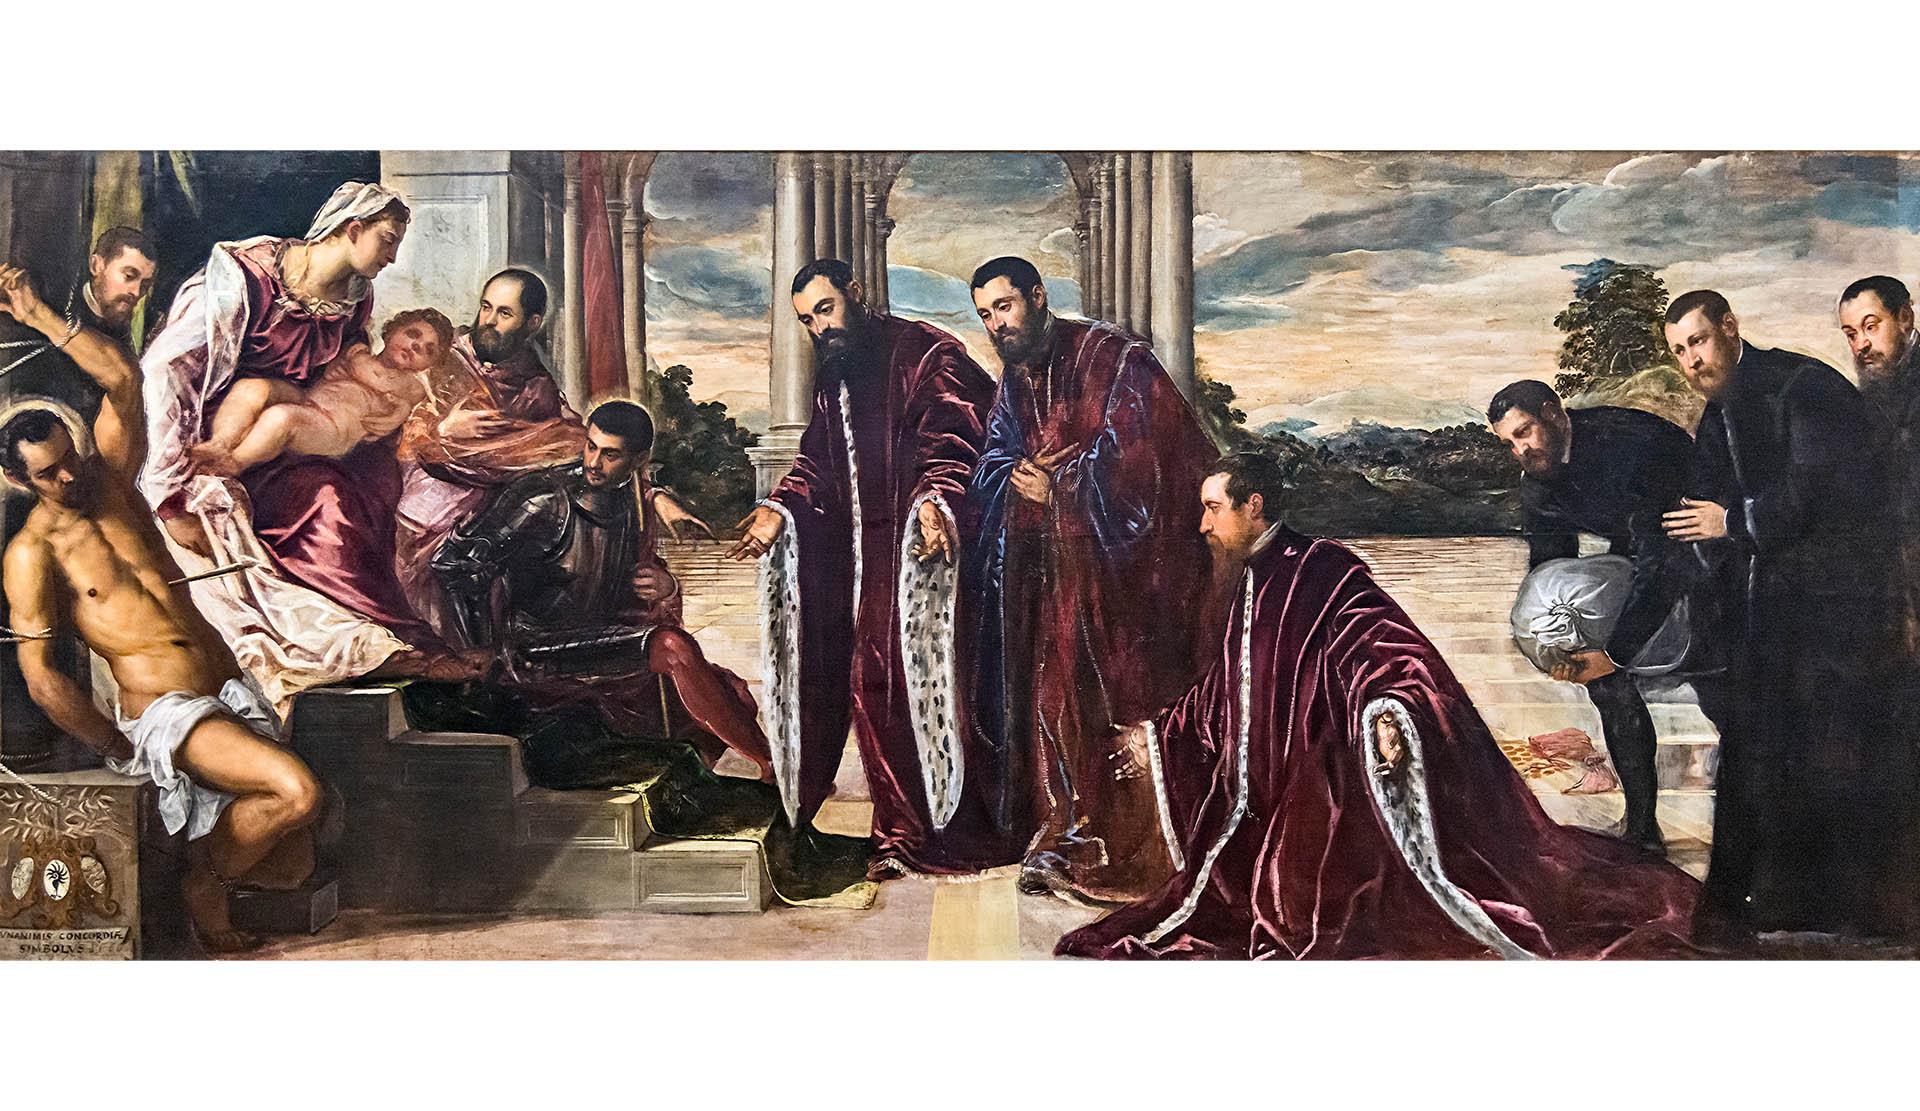 Tintoretto, Madonna